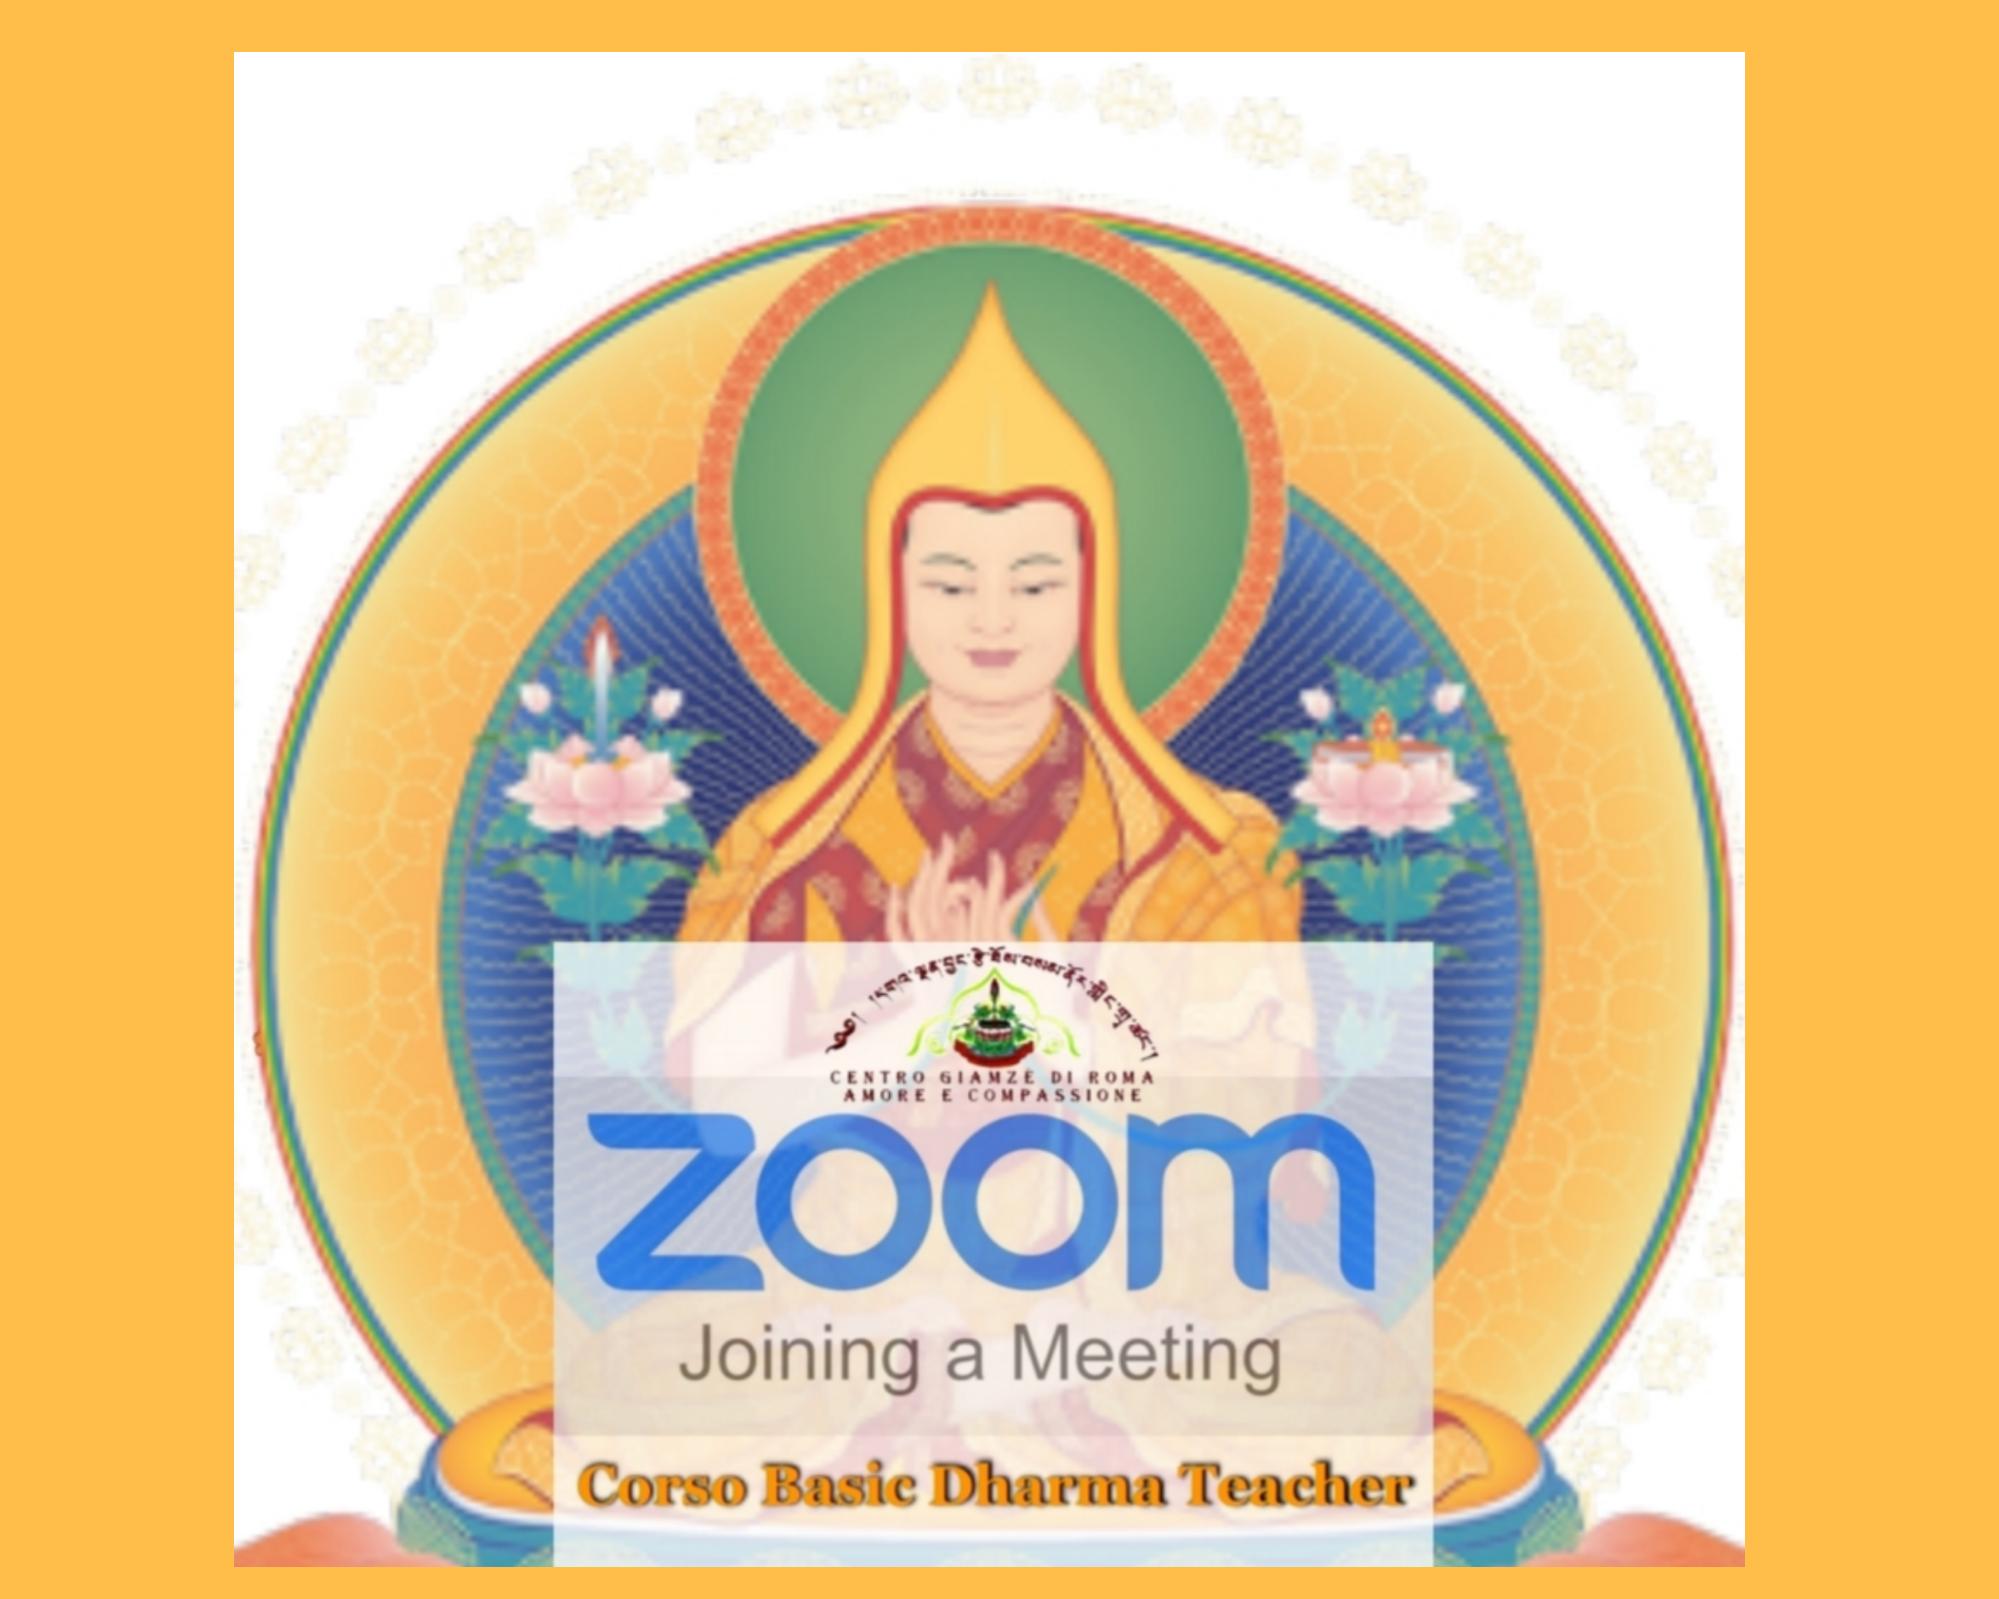 Besic Dharma Teacher in Colleghamento Zoom